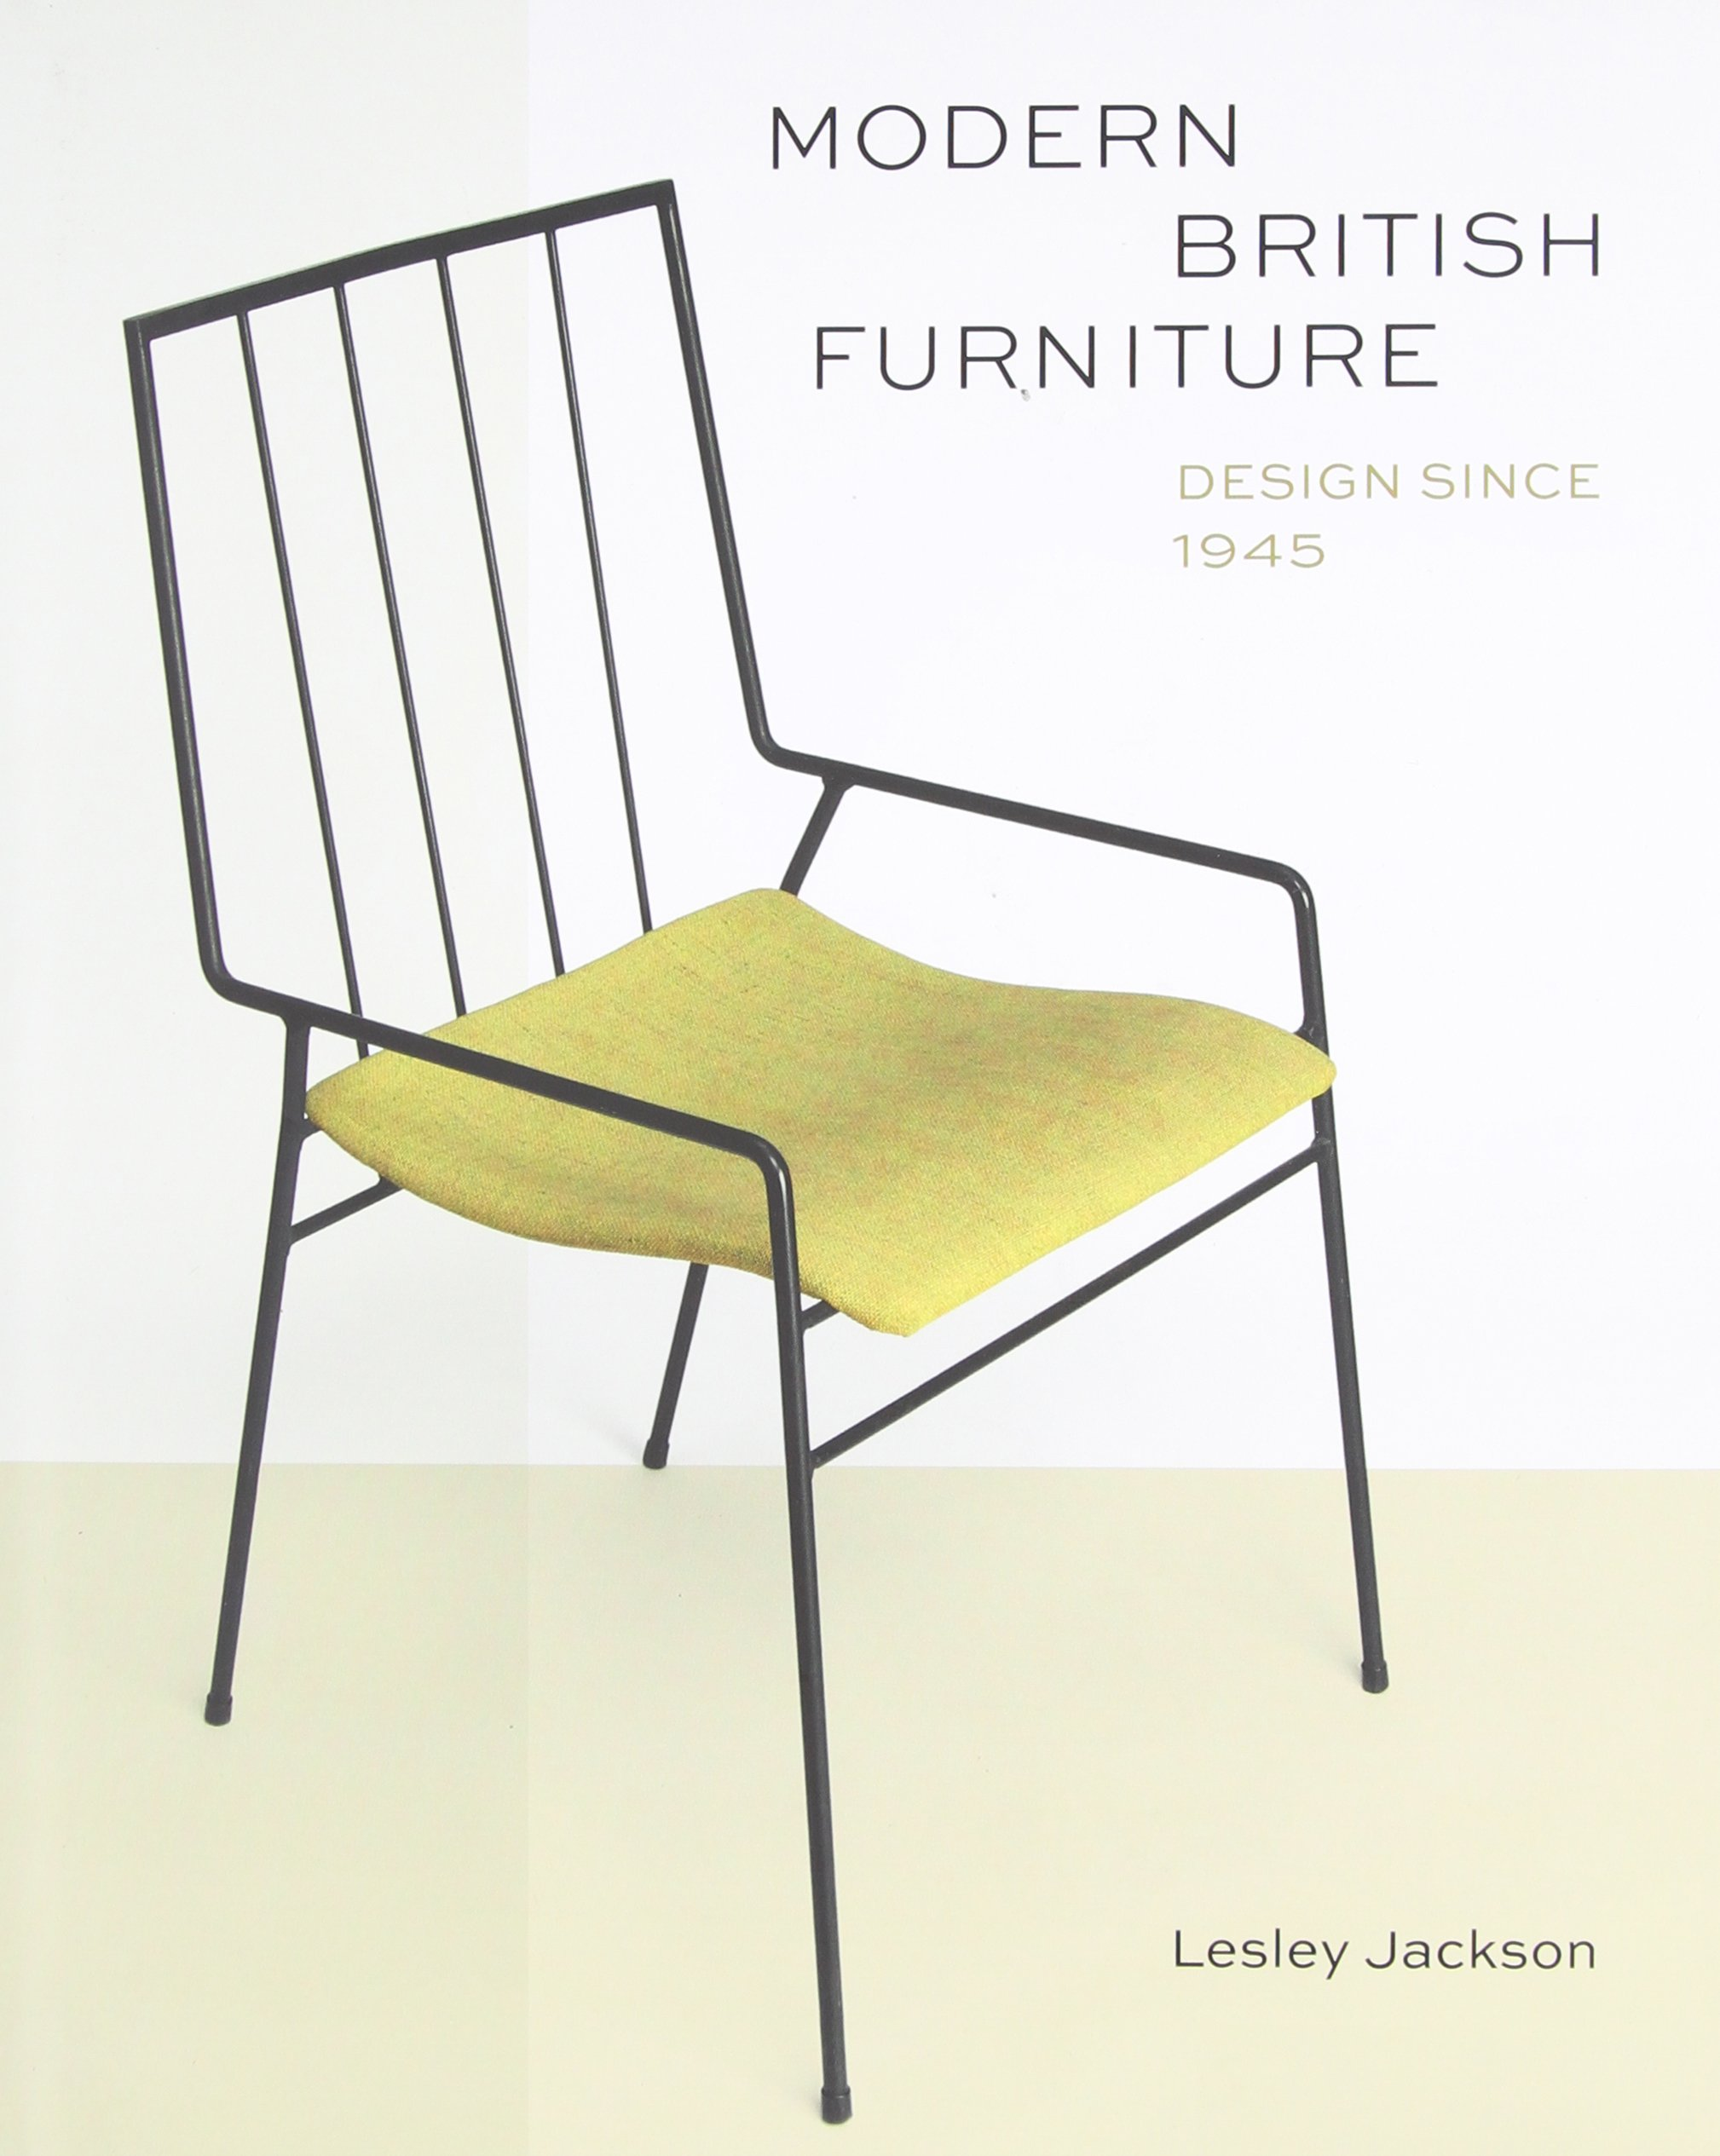 Modern British Furniture  Design Since 1945  Amazon co uk  Lesley Jackson   9781851777594  Books. Modern British Furniture  Design Since 1945  Amazon co uk  Lesley